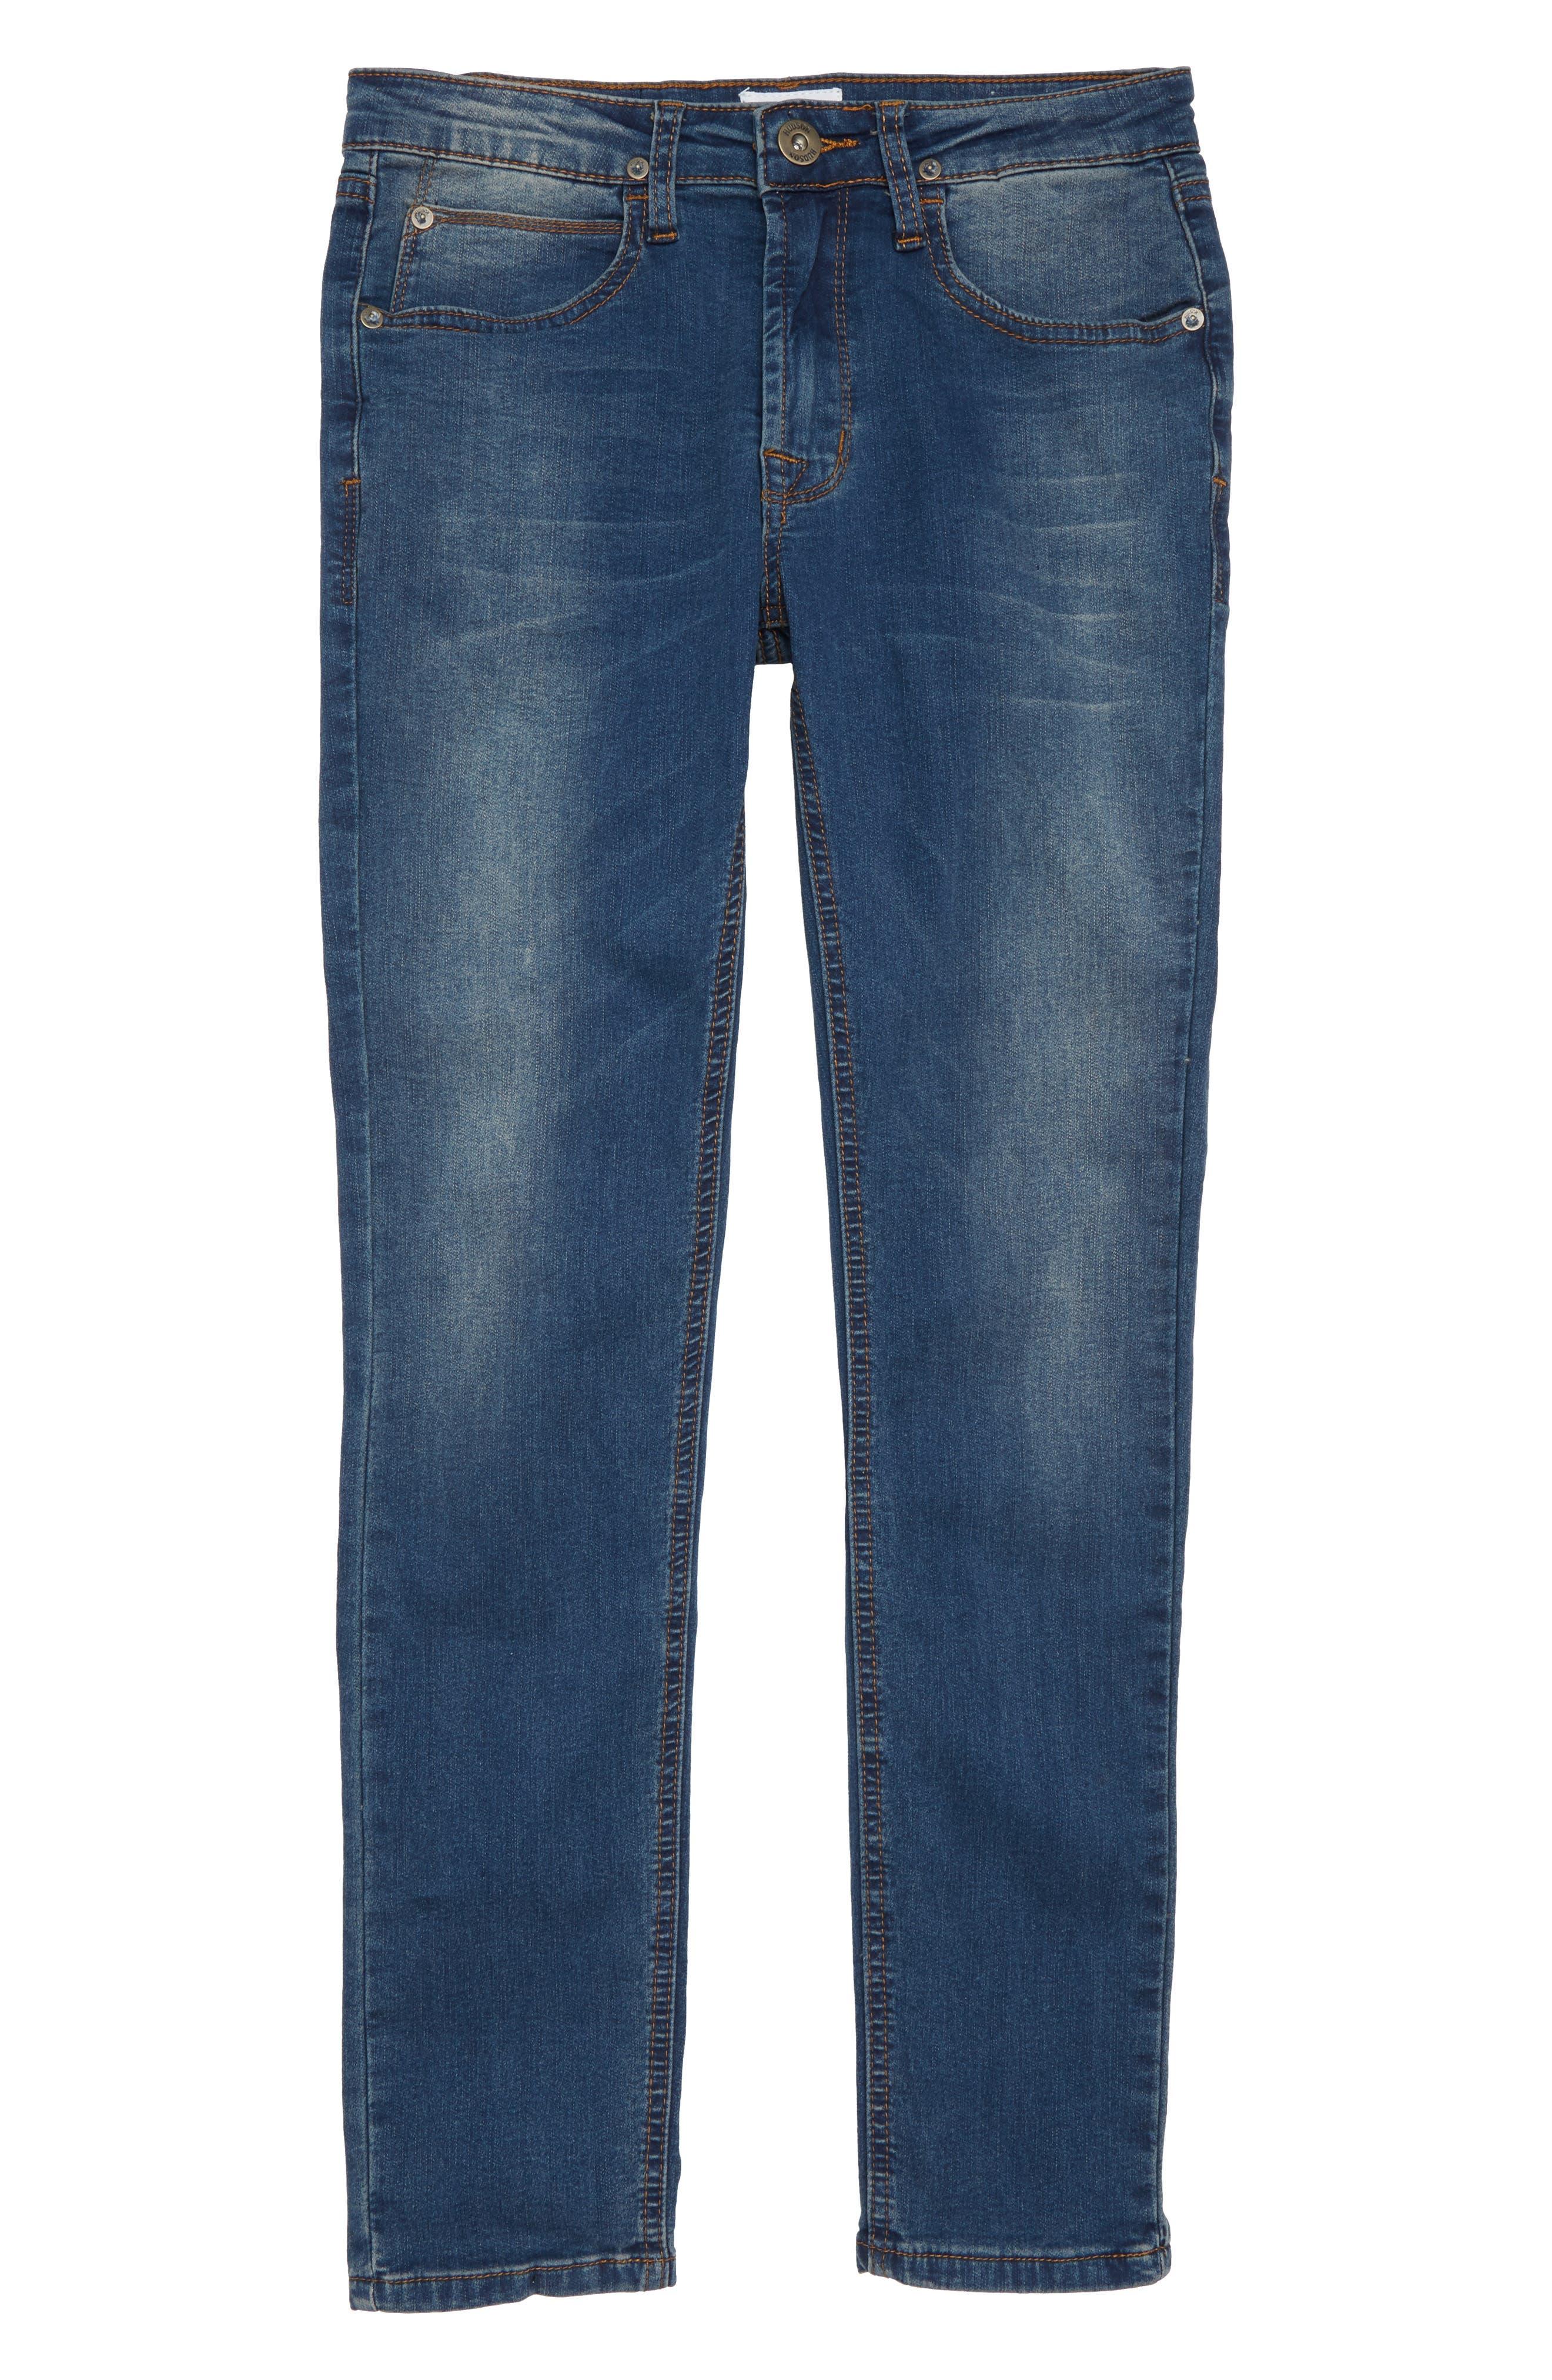 Jagger Slim Fit Straight Leg Jeans,                             Main thumbnail 1, color,                             Beaten Blue